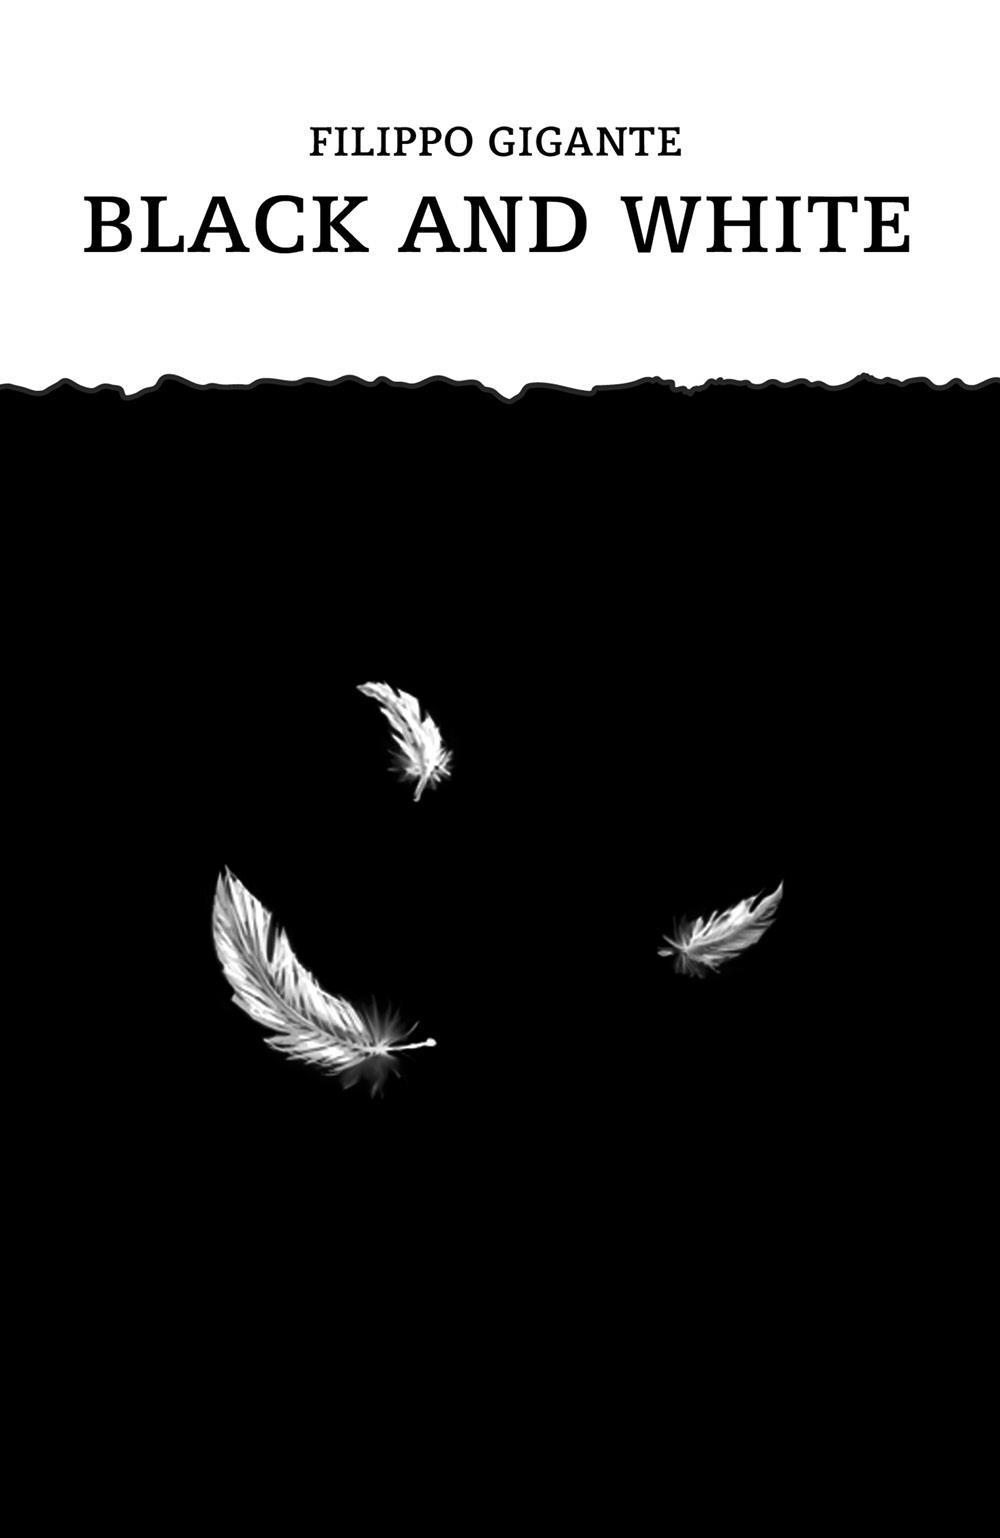 Black and white. Translated by Anita Kubaisi